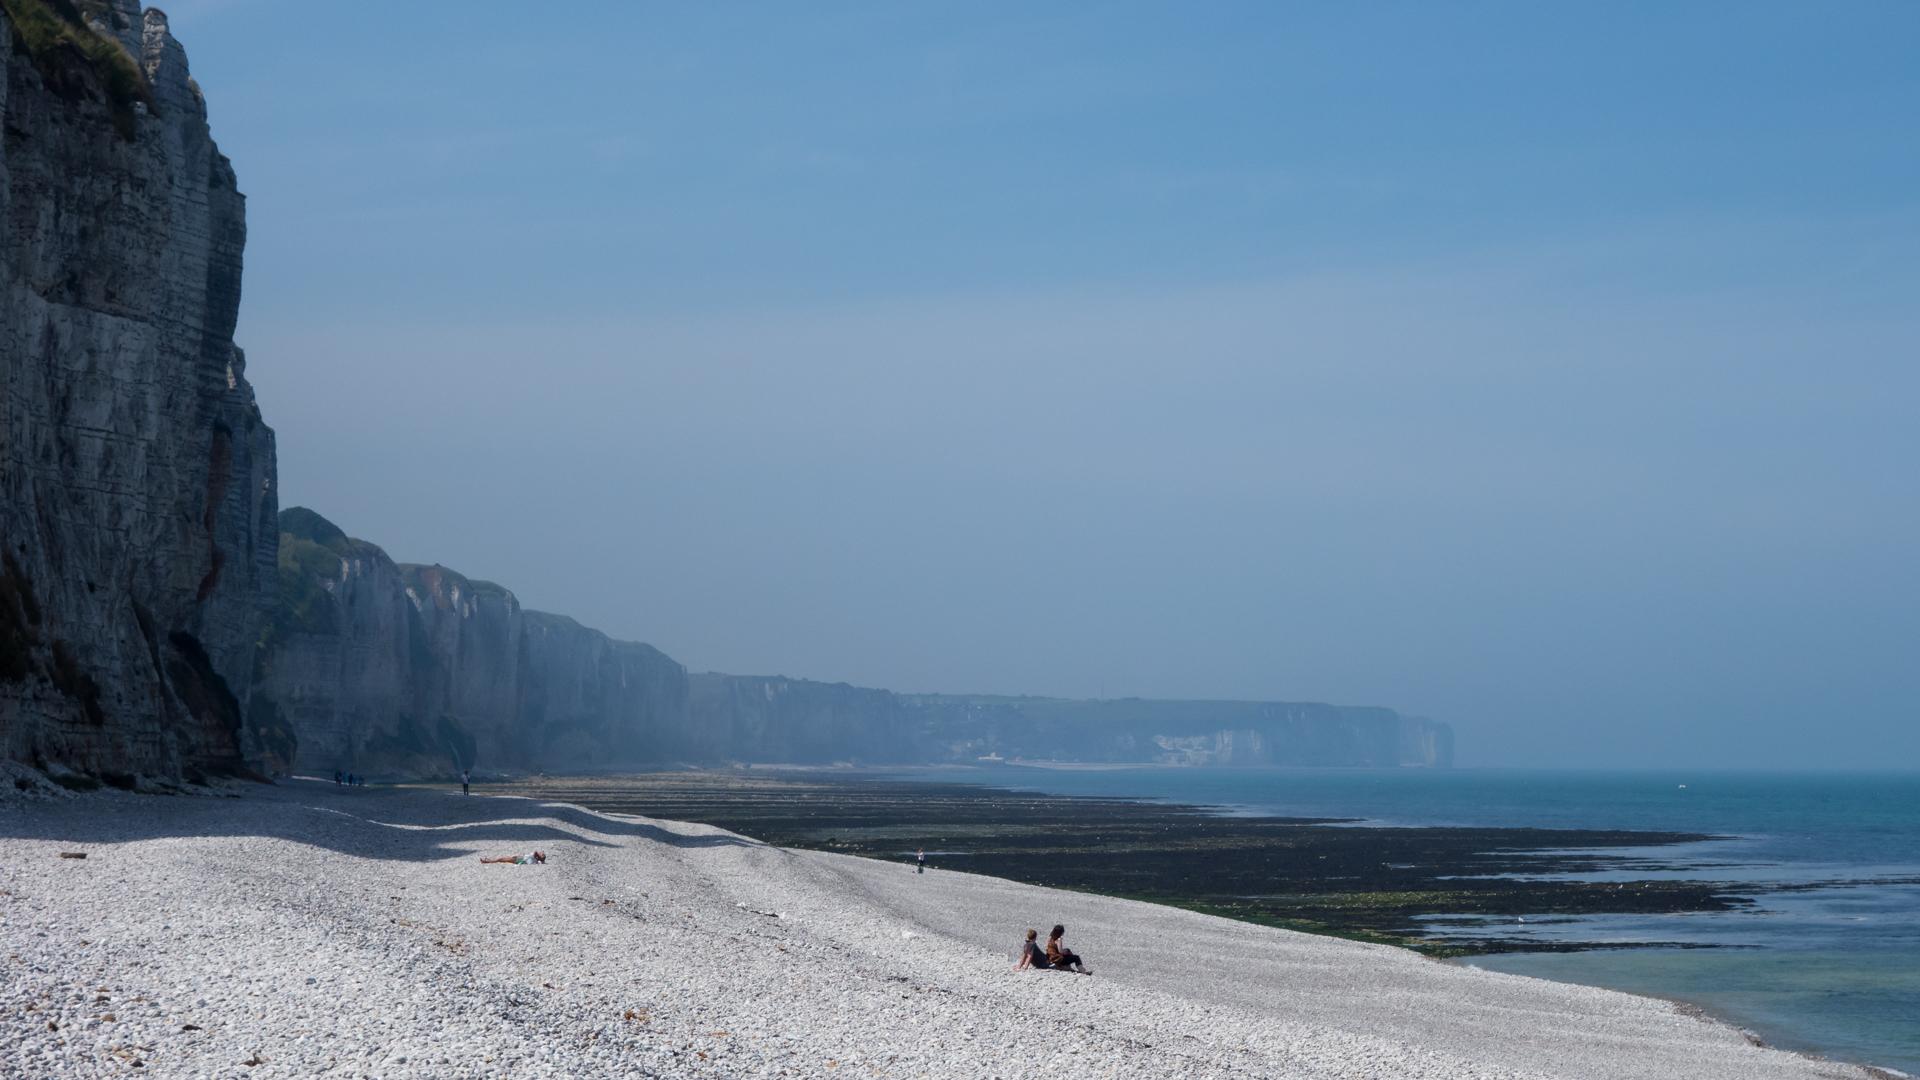 Must see Wallpaper Mountain Beach - beach-sea-coast-ocean-mountain-shore-cliff-bay-terrain-body-of-water-falaise-normandie-cape-monet-fecamp-paysdecaux-caux-landform-impressionniste-417236  Best Photo Reference_527293.jpg